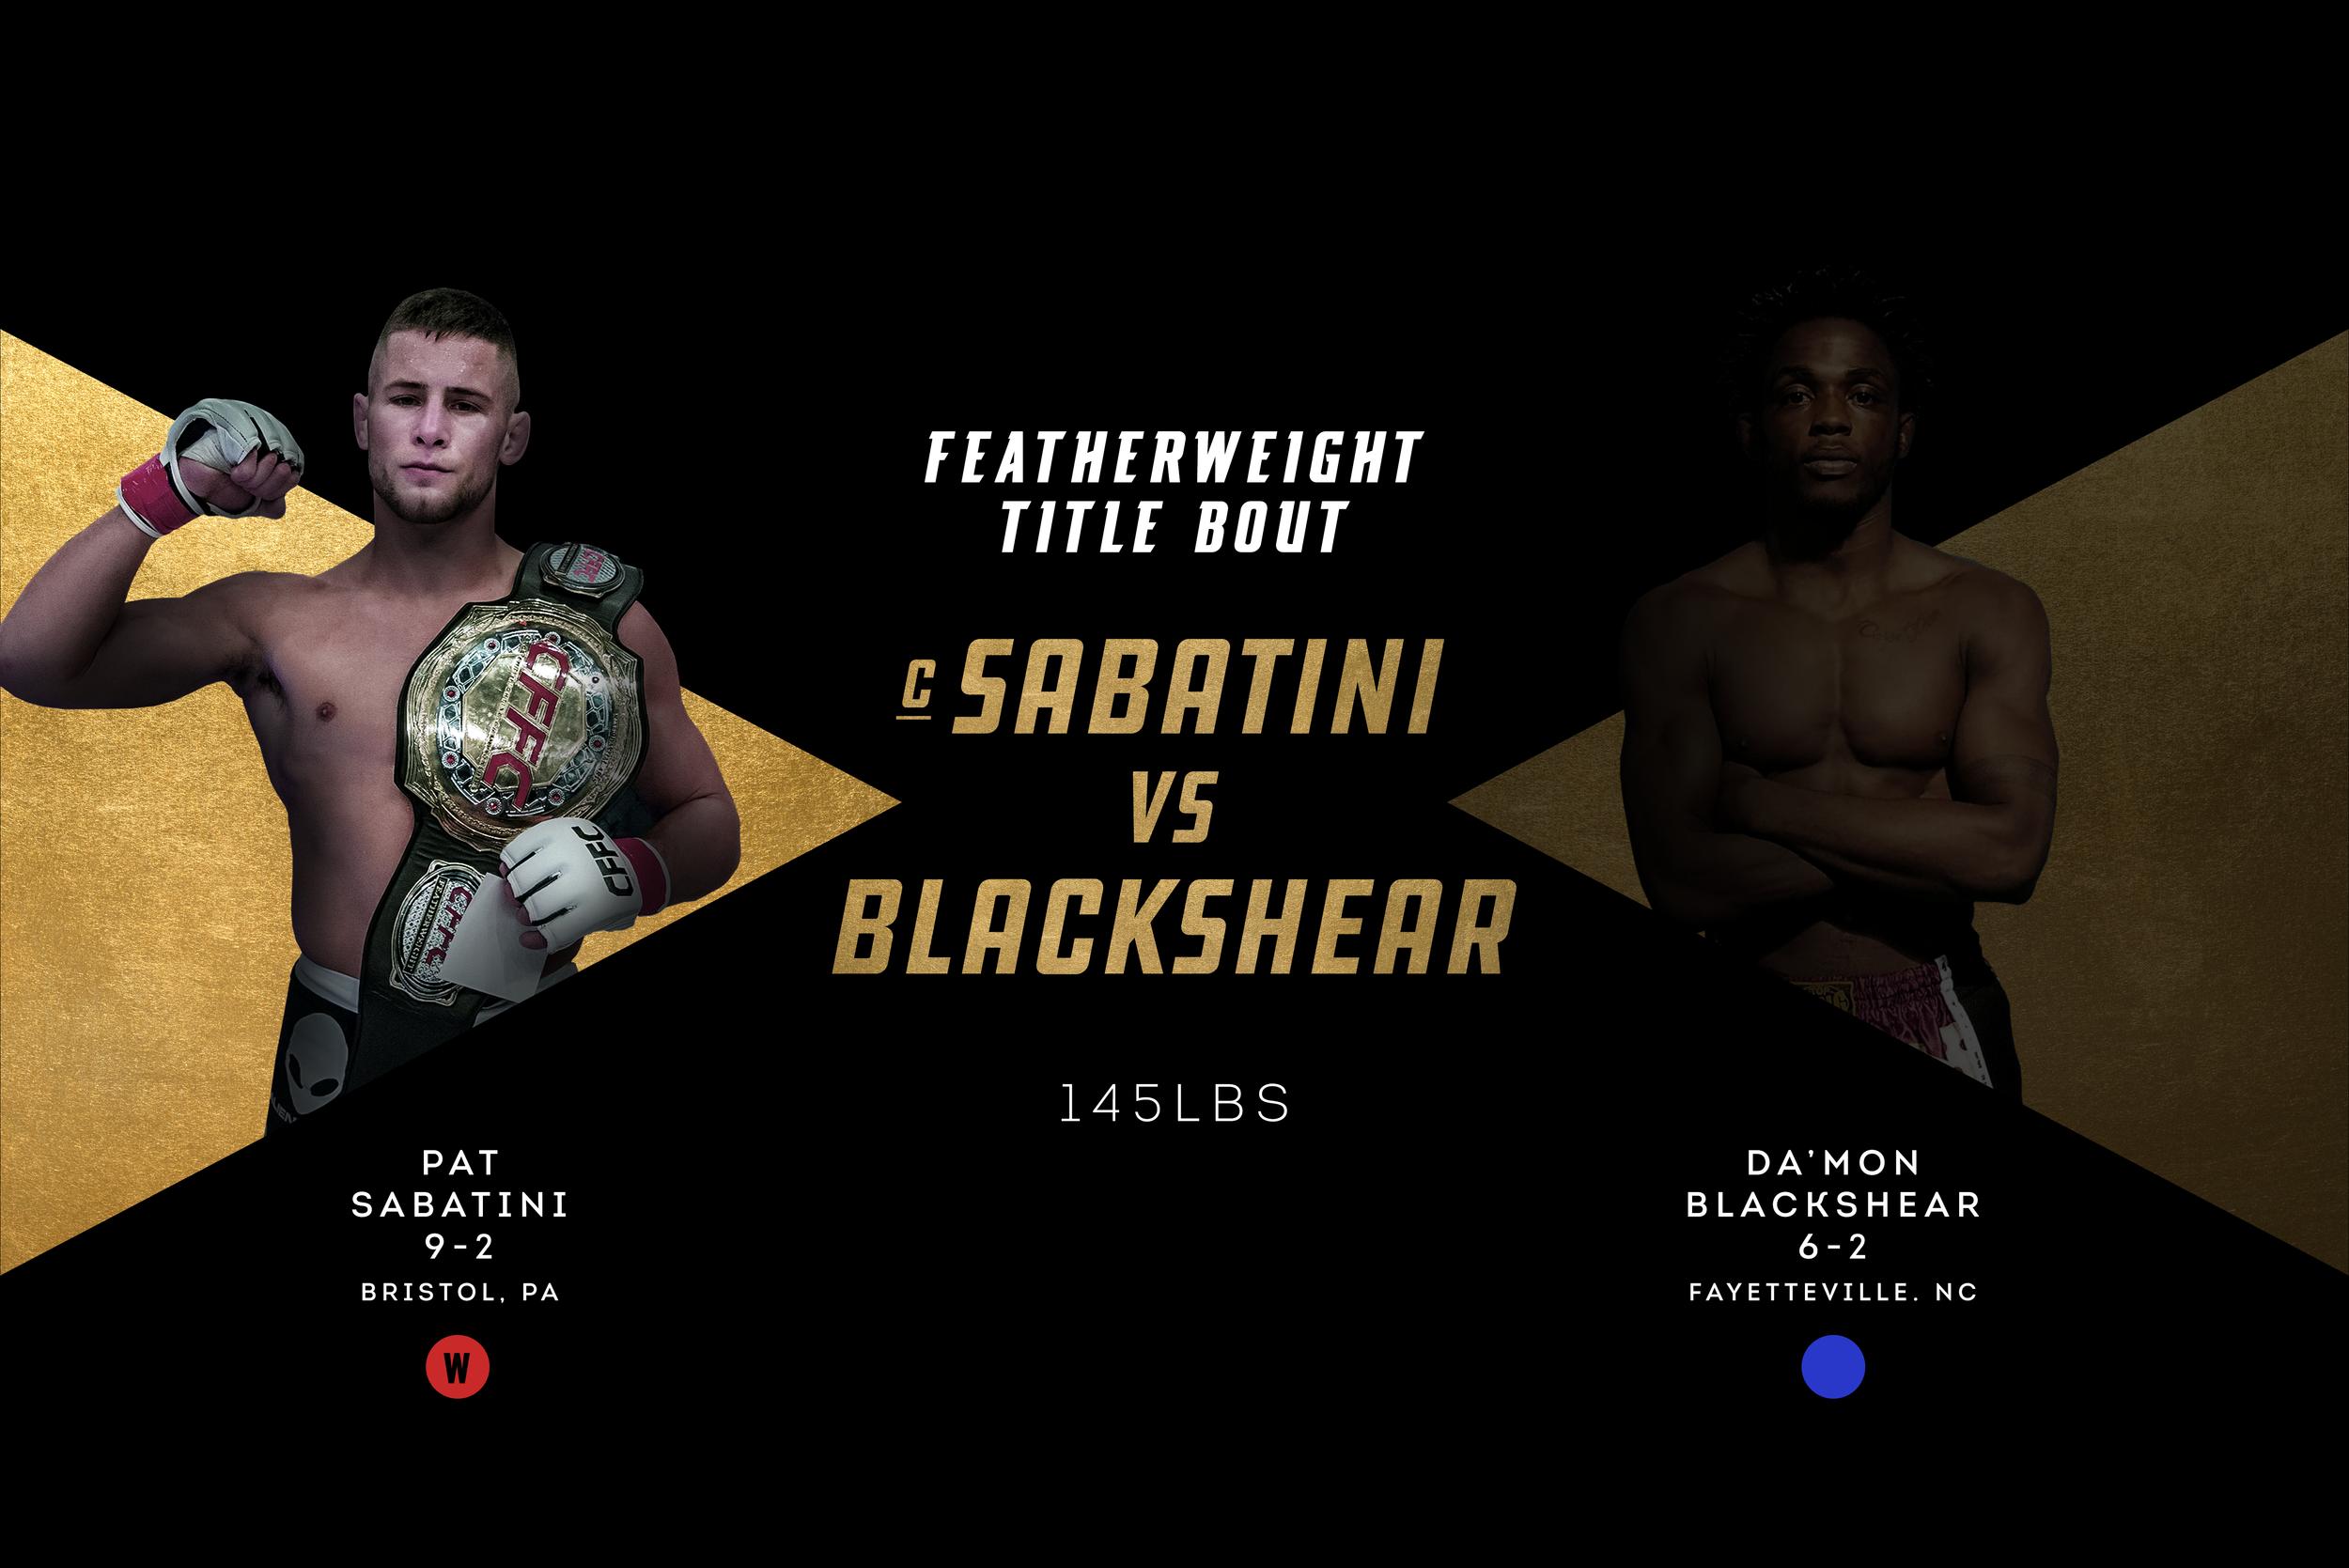 Sabatini_VS_Blackshear.png